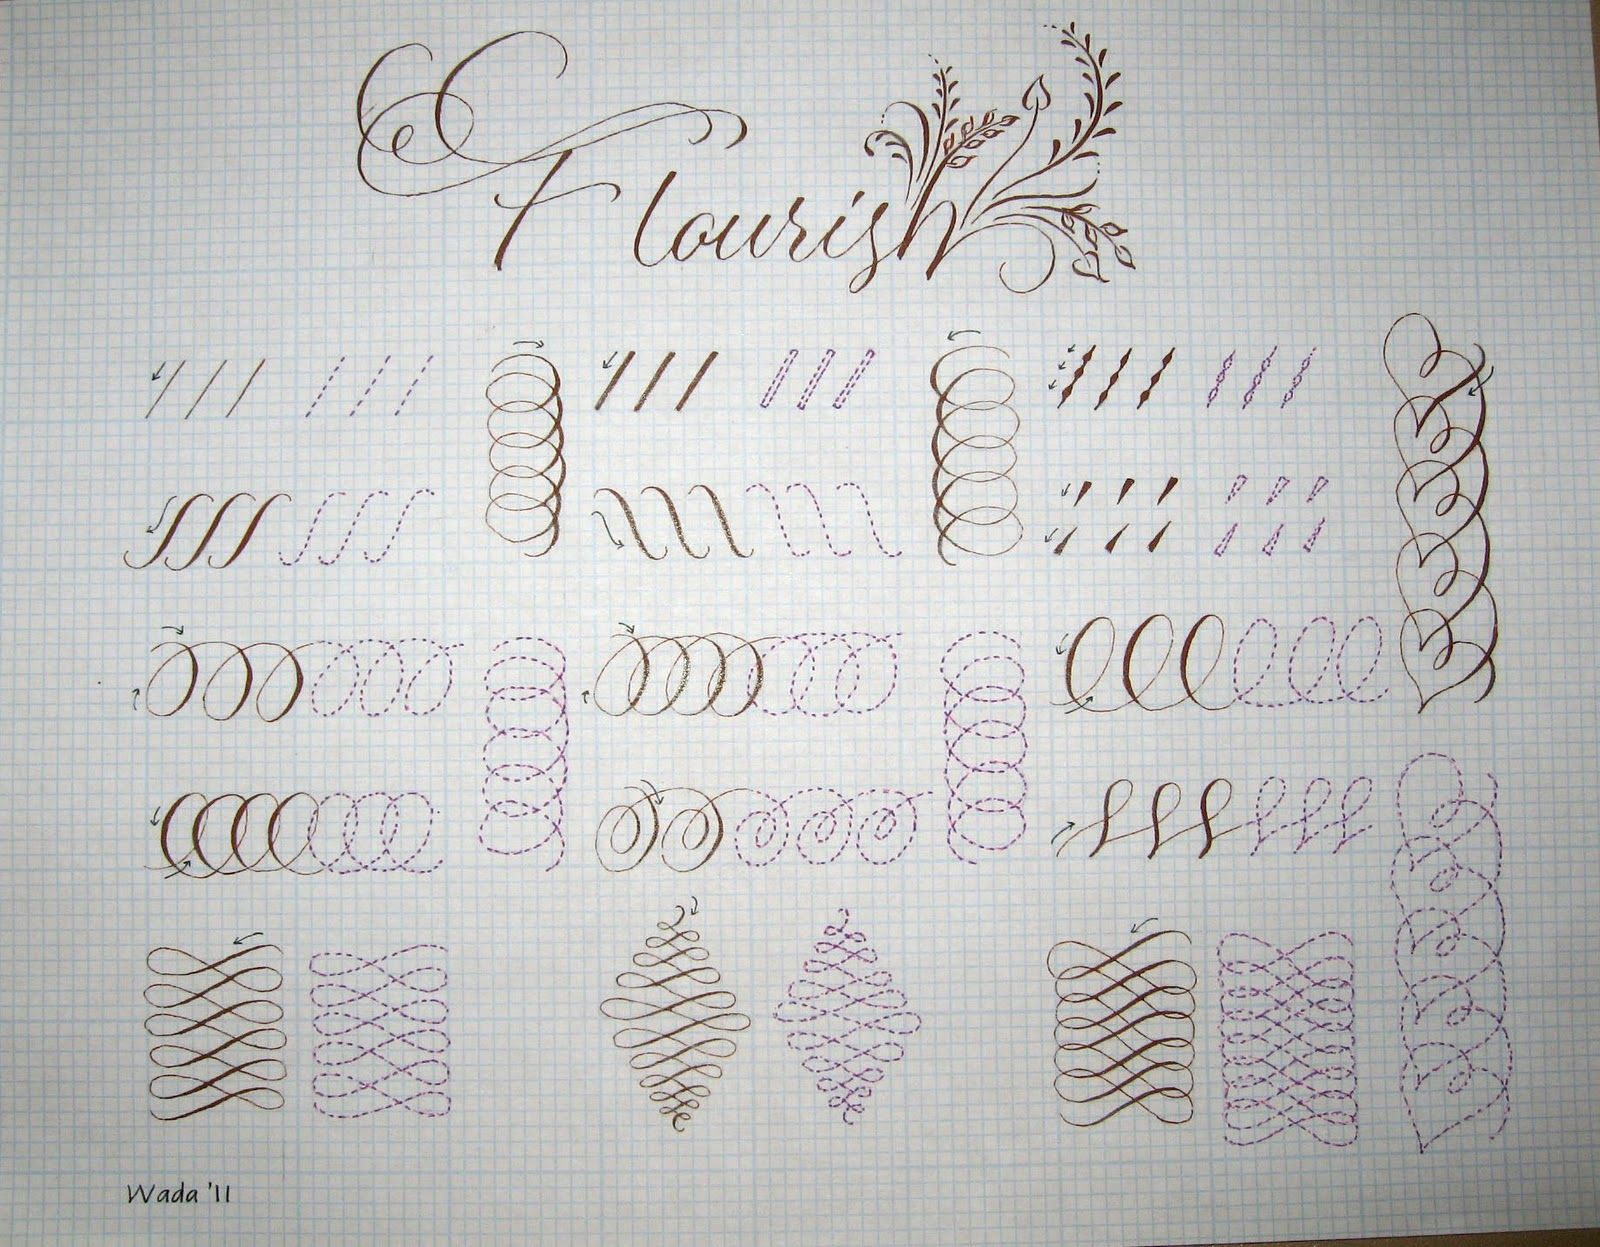 Deann Singh Calligraphy November 21